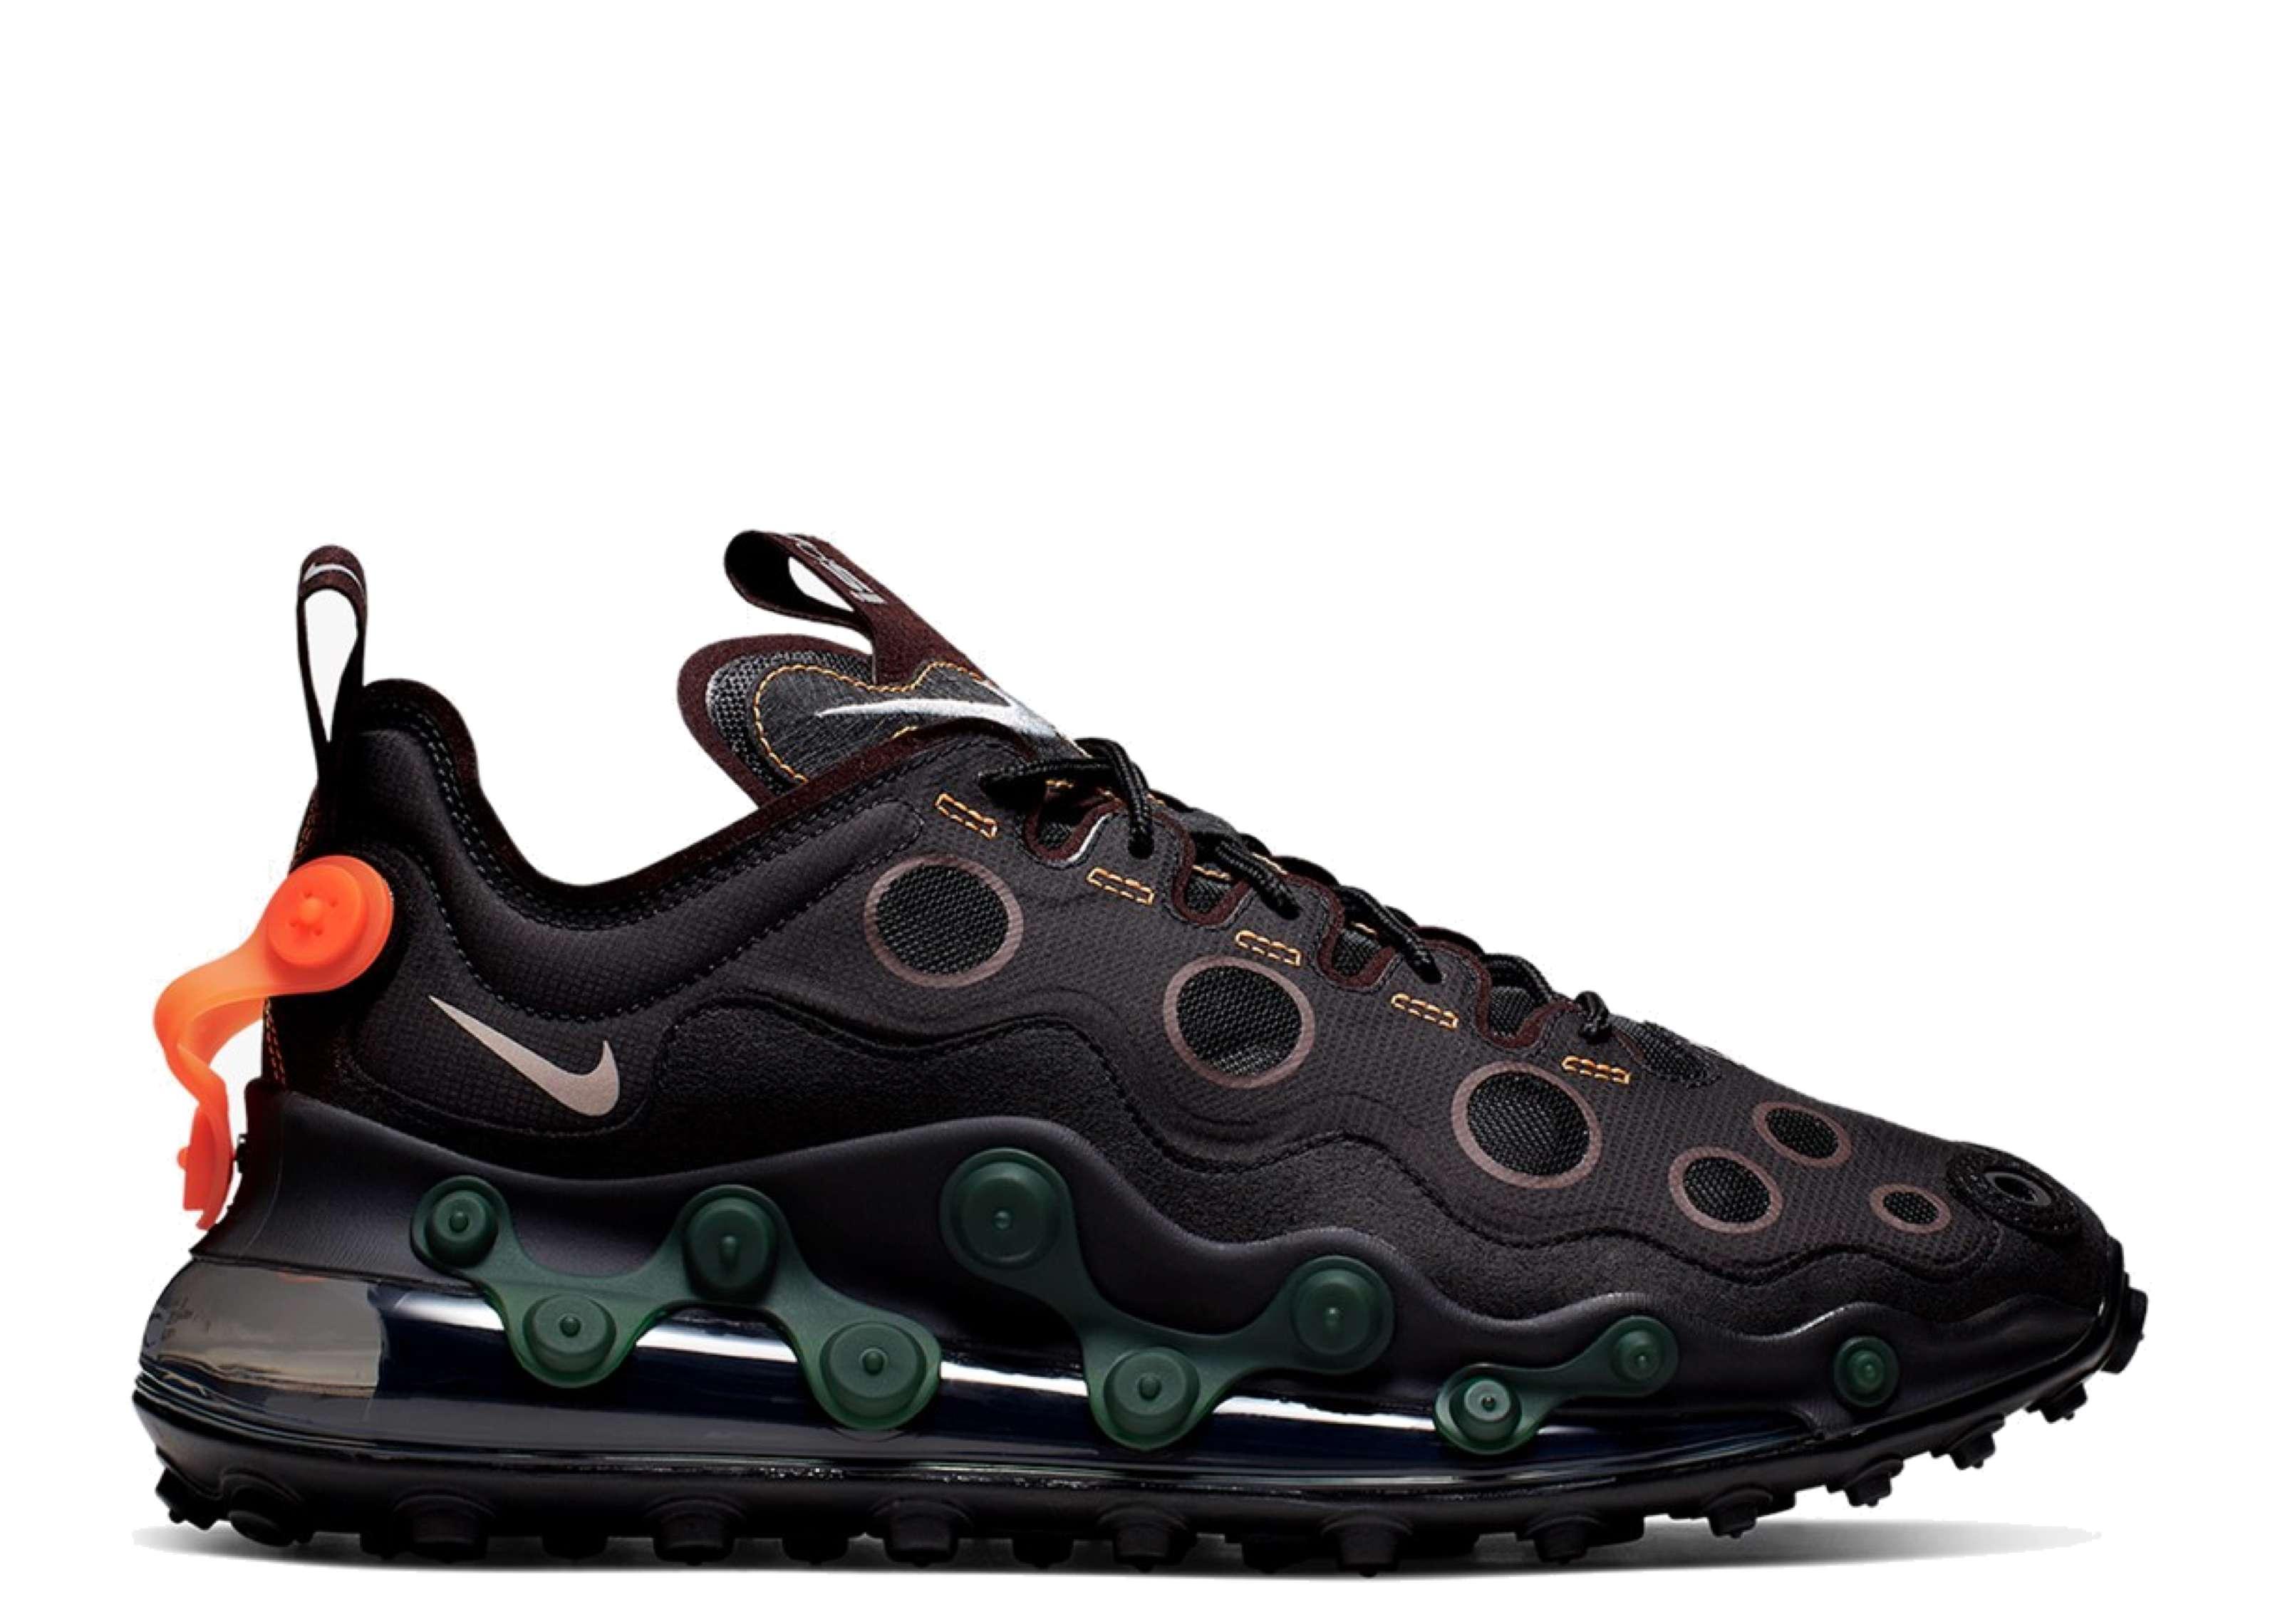 Nike Sneakers Air Max Plus OG Orange BQ4629 #000#001#4 One